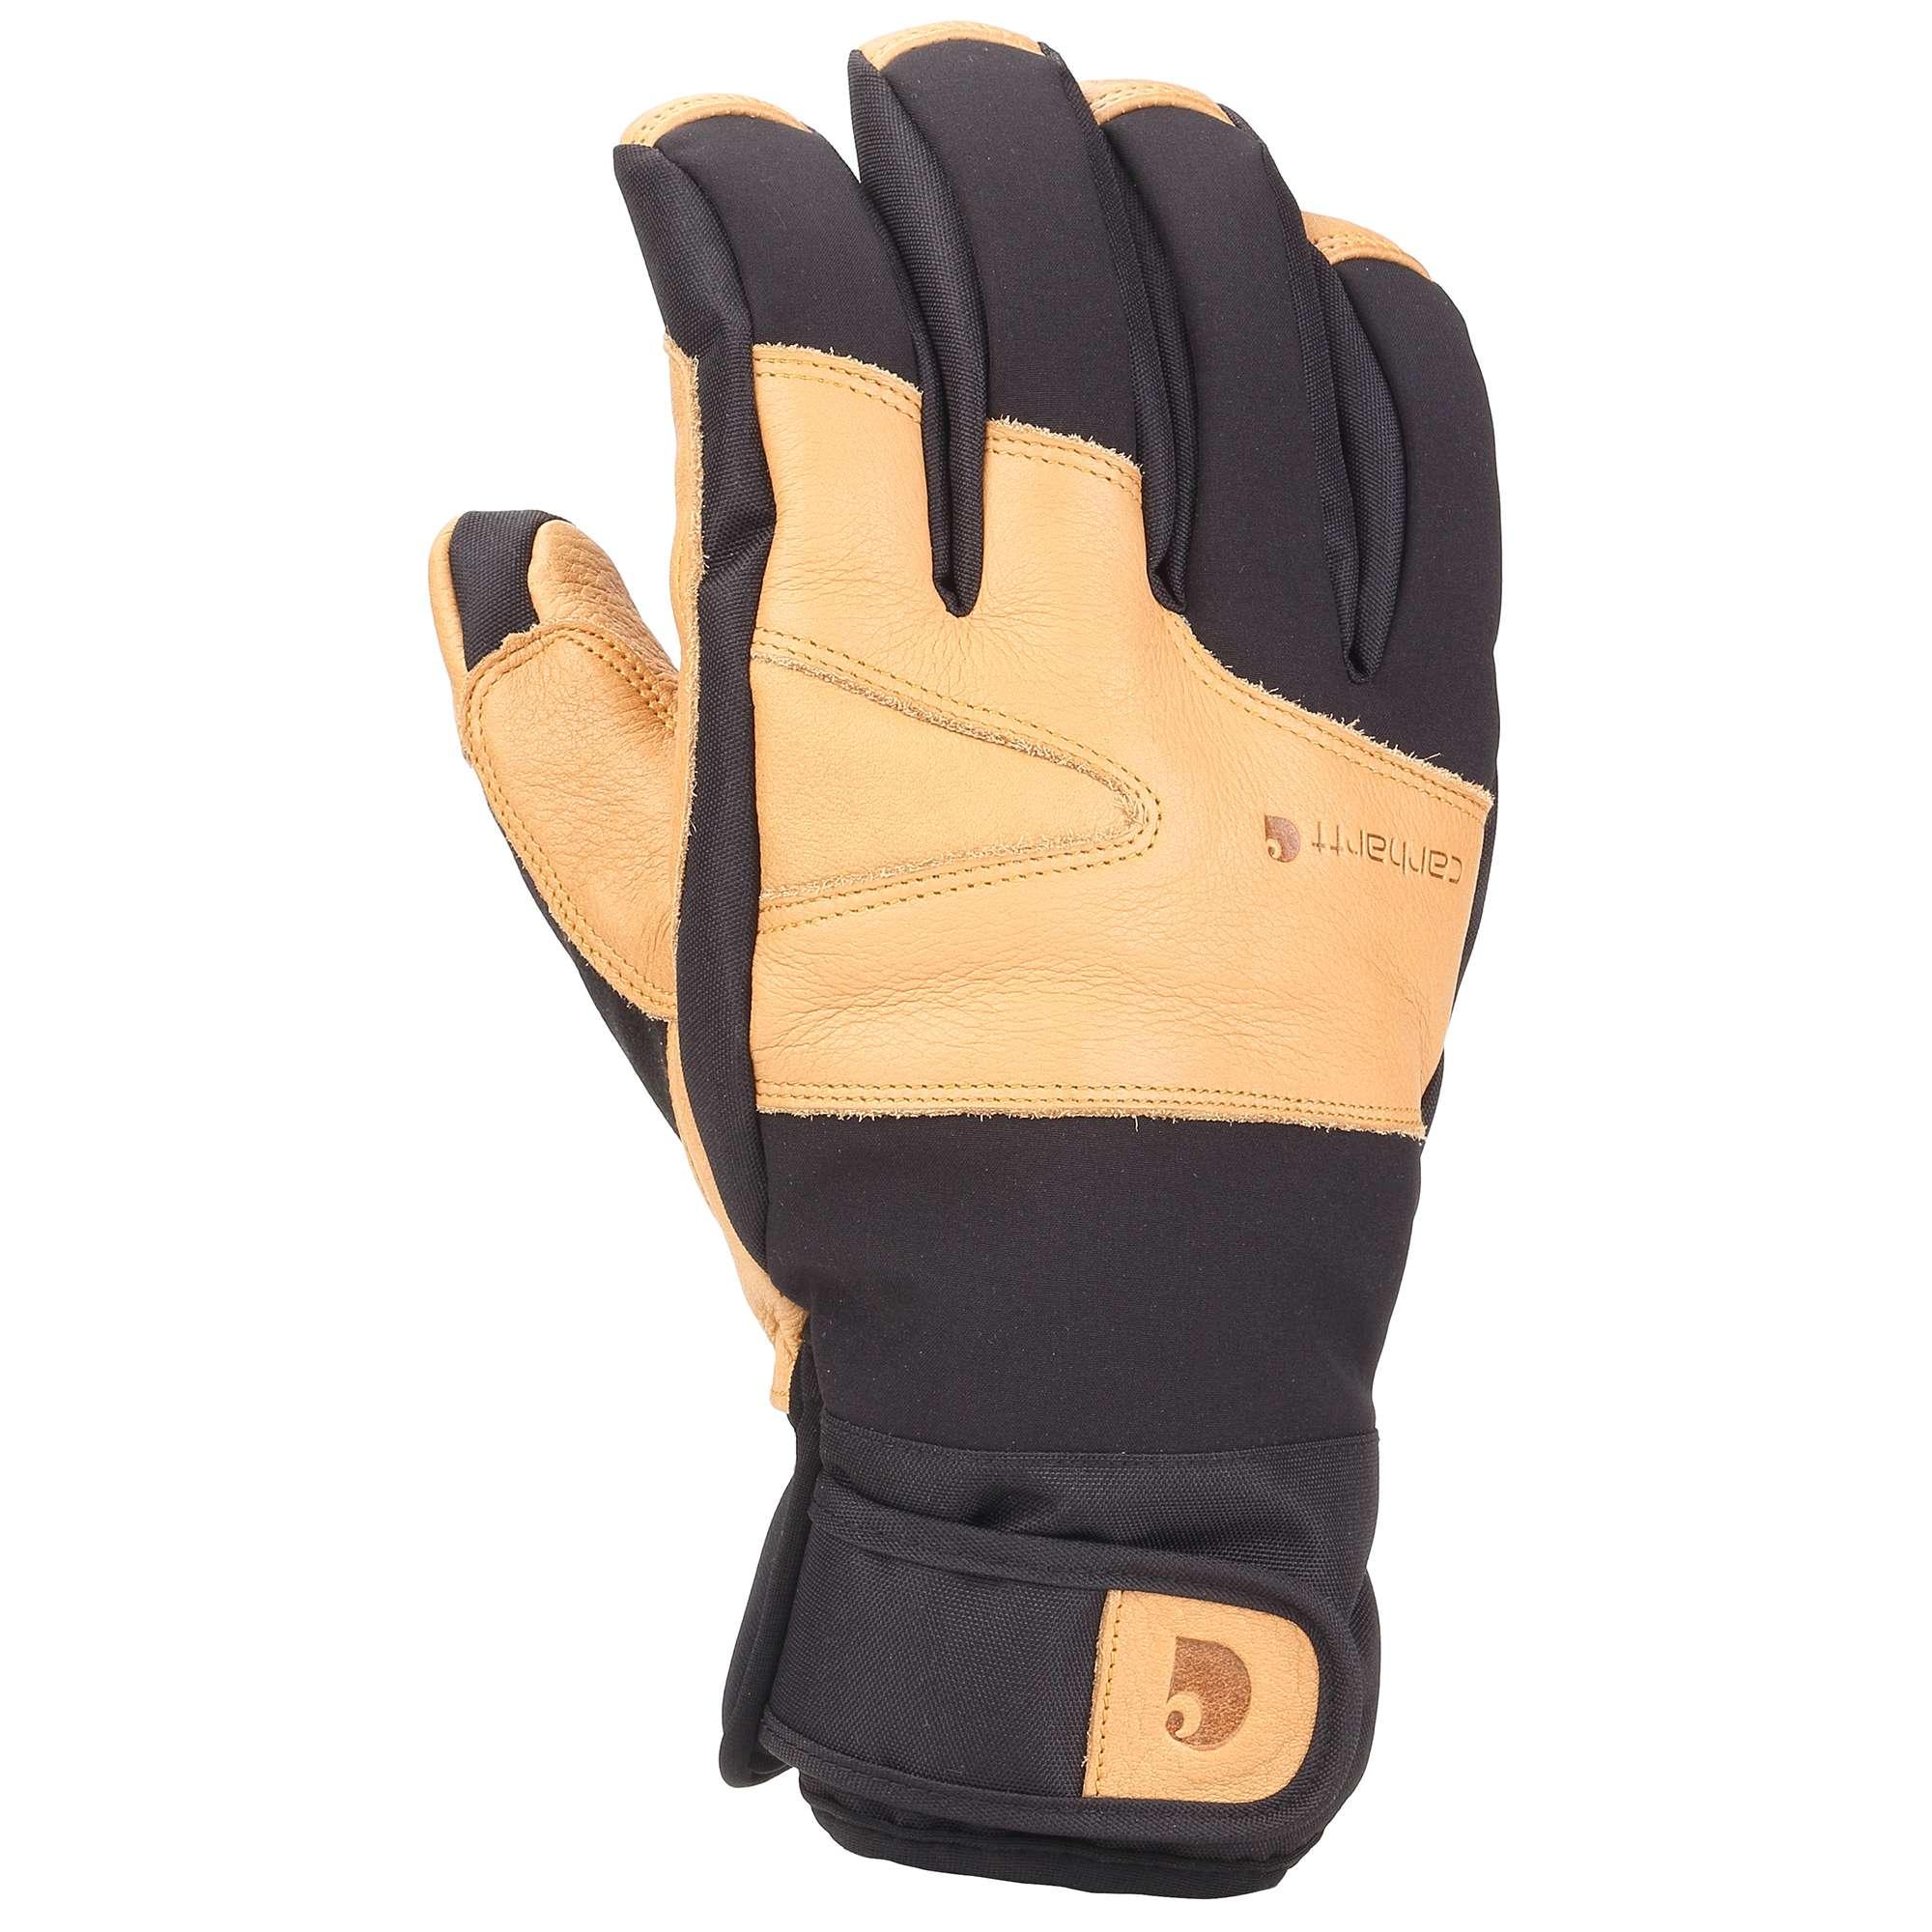 Carhartt Winter Dex Cow Grain Insulated Glove